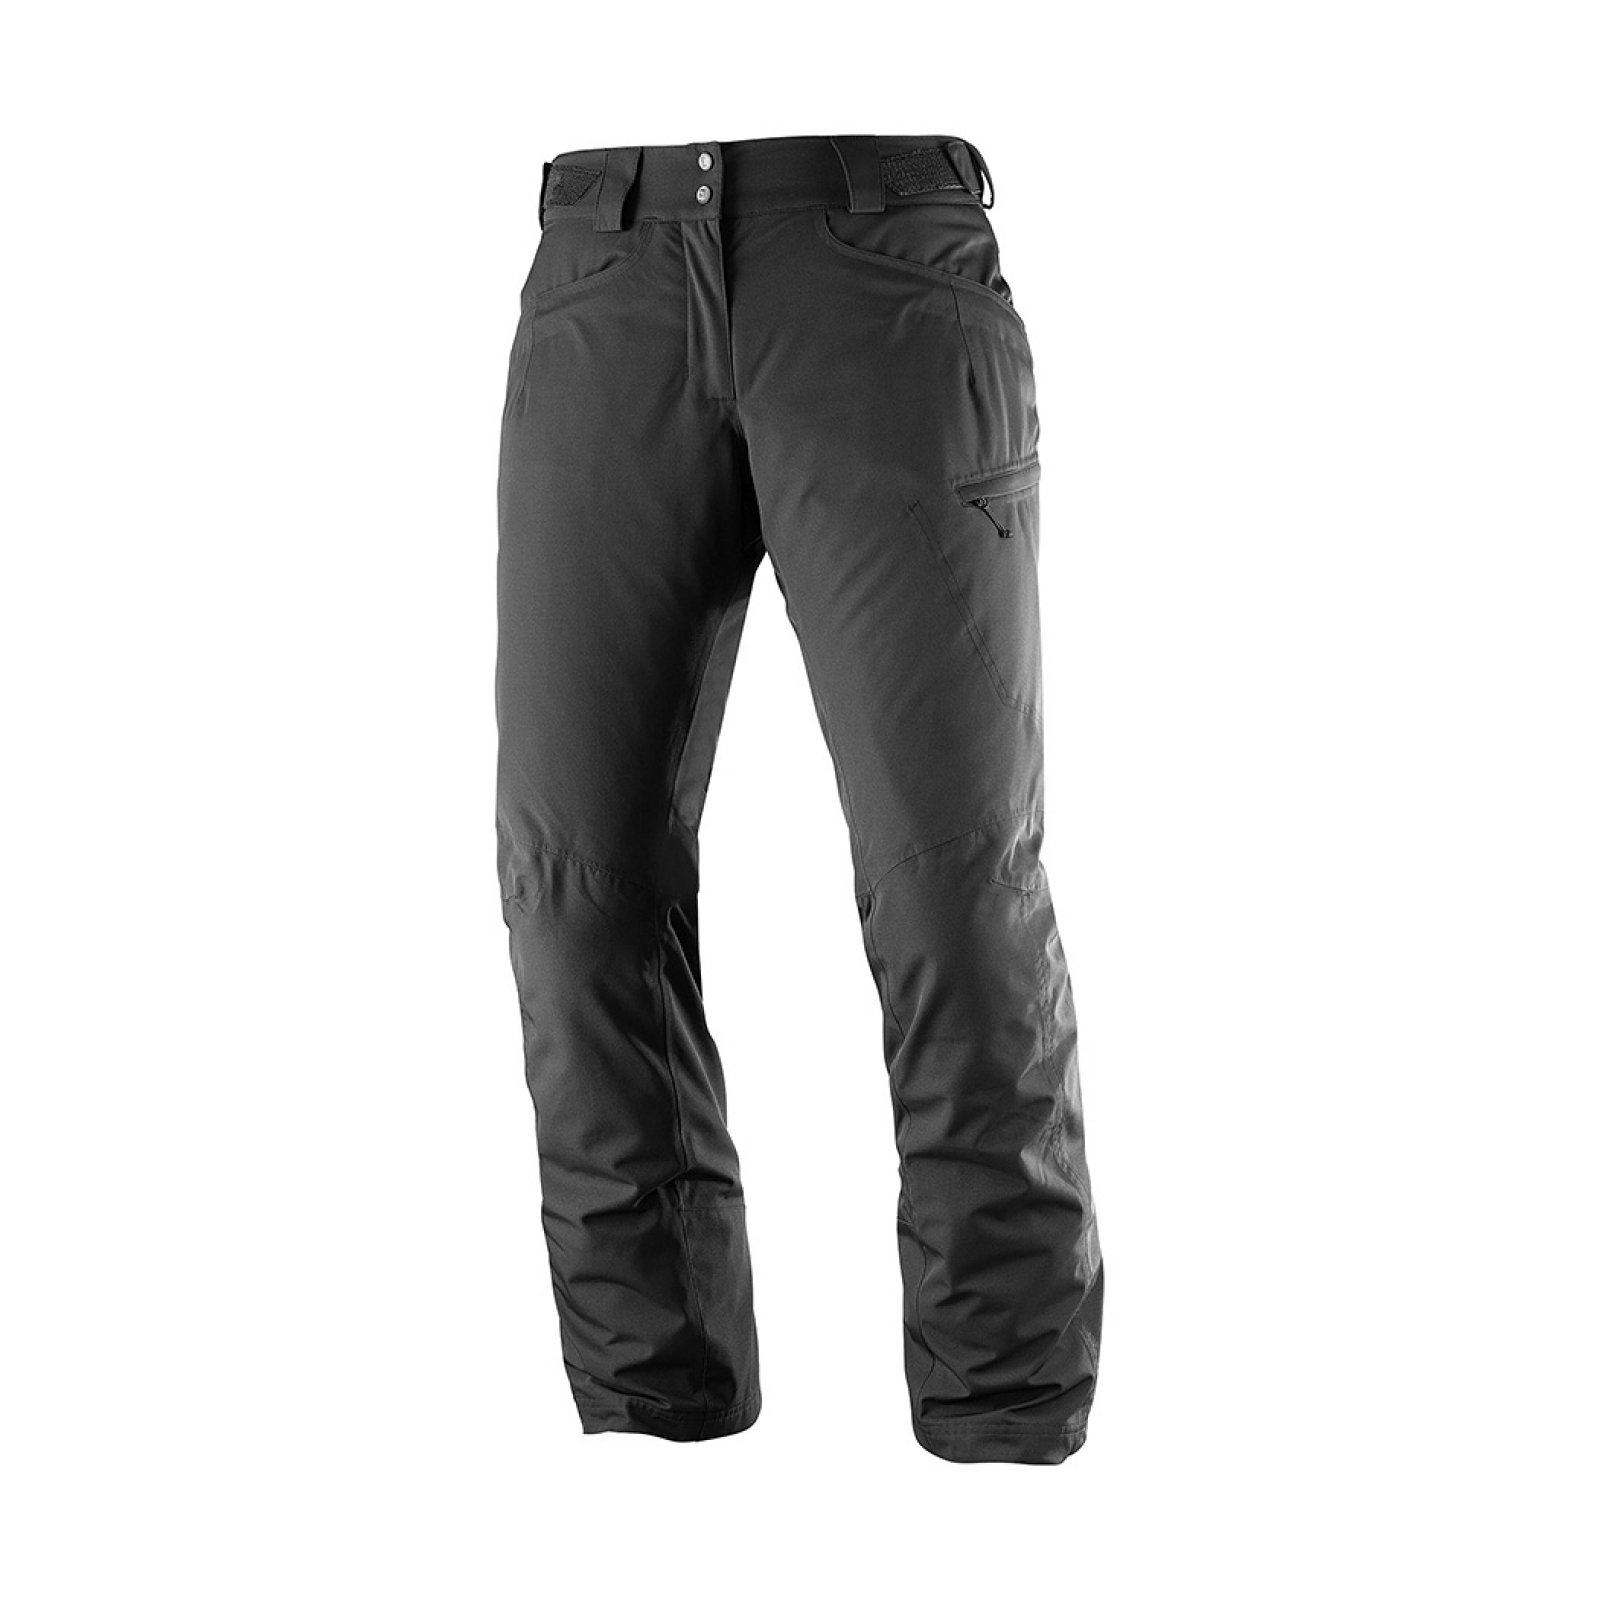 Lyžařské kalhoty Salomon Fantasy Pant W black heather L39889600 ... 900d1bfafe